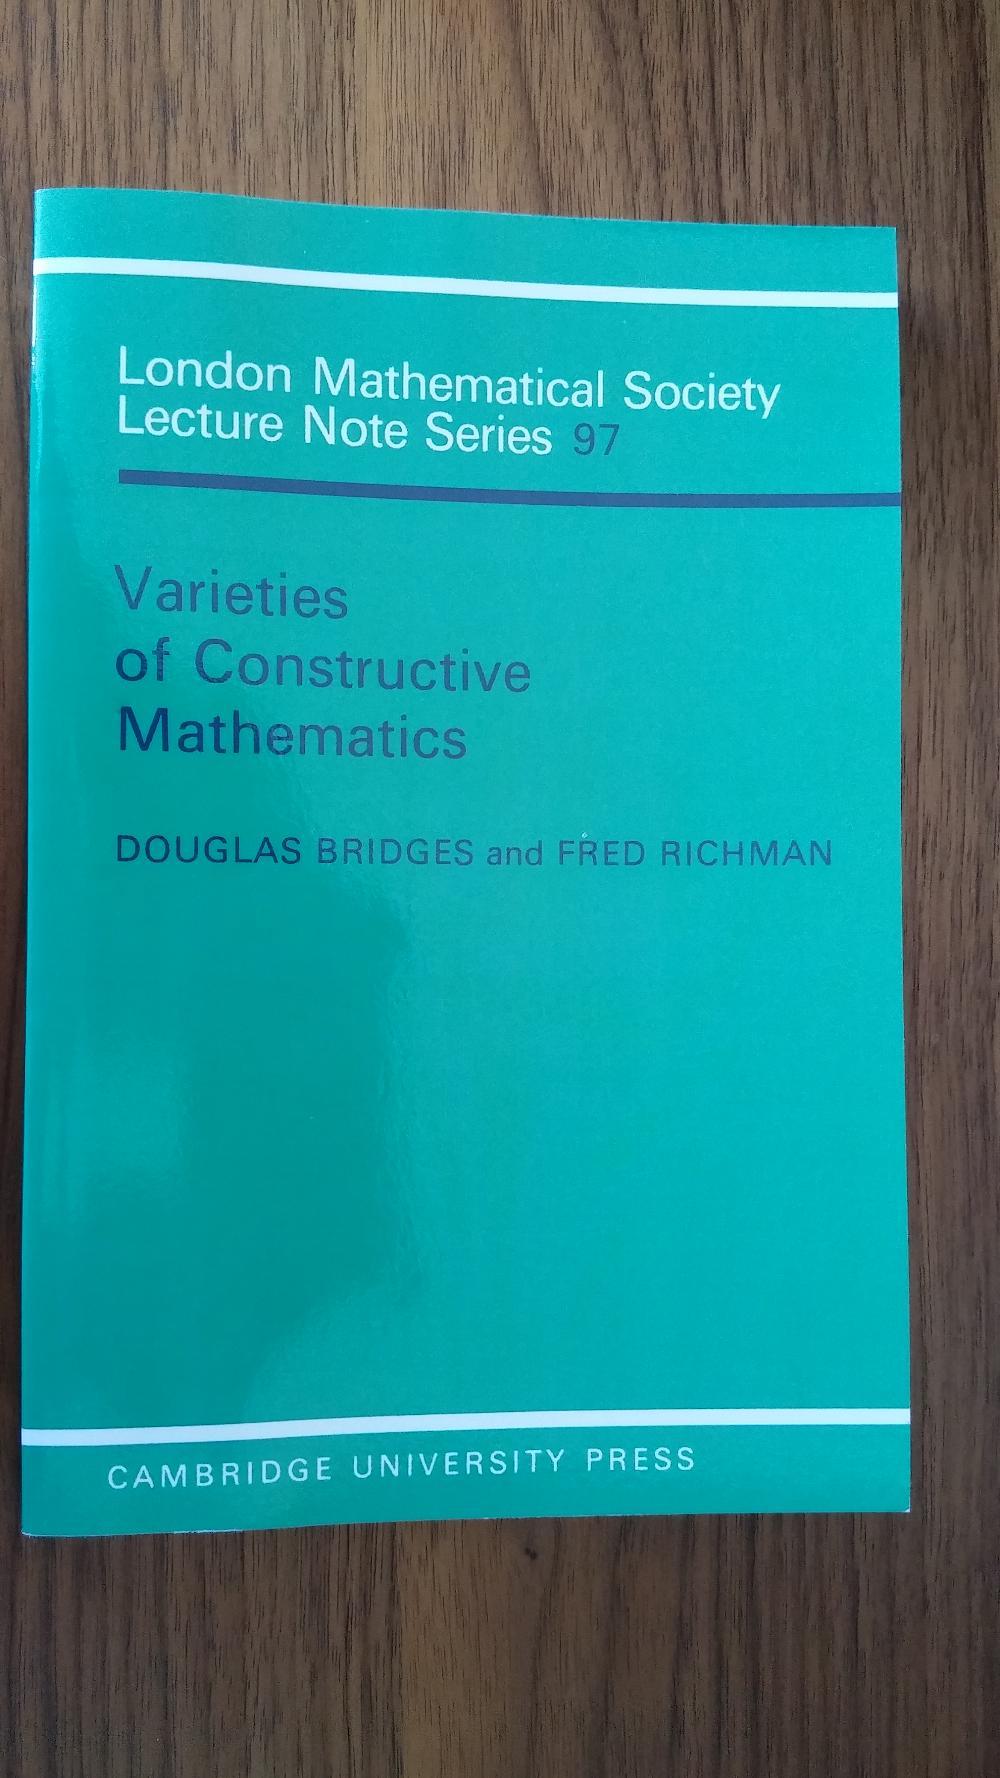 Douglas S  Bridges - My Mathematics